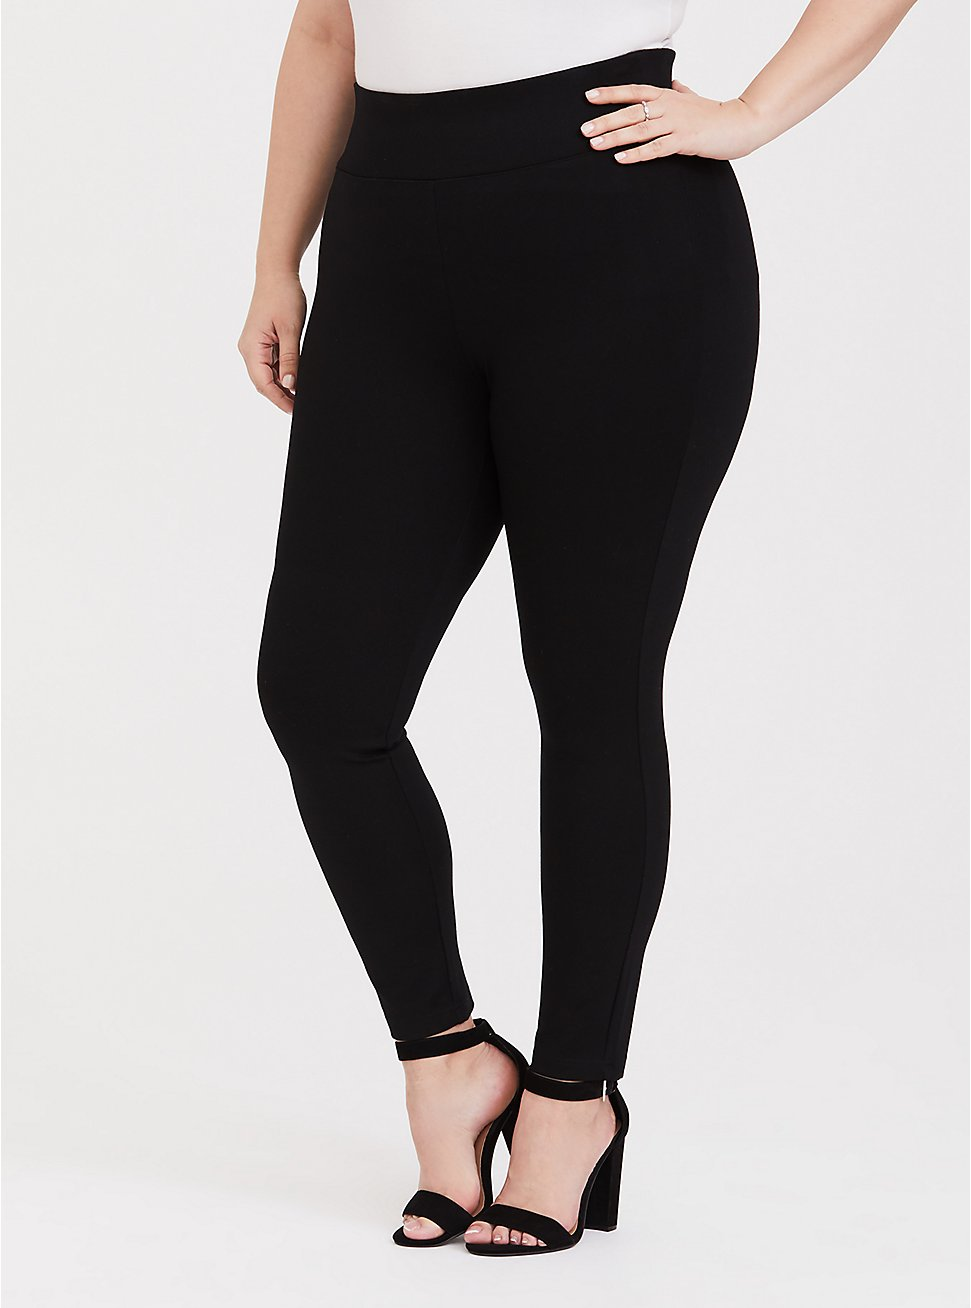 Studio Ponte Slim Fix Black Pull-On Pixie Pant, , fitModel1-hires